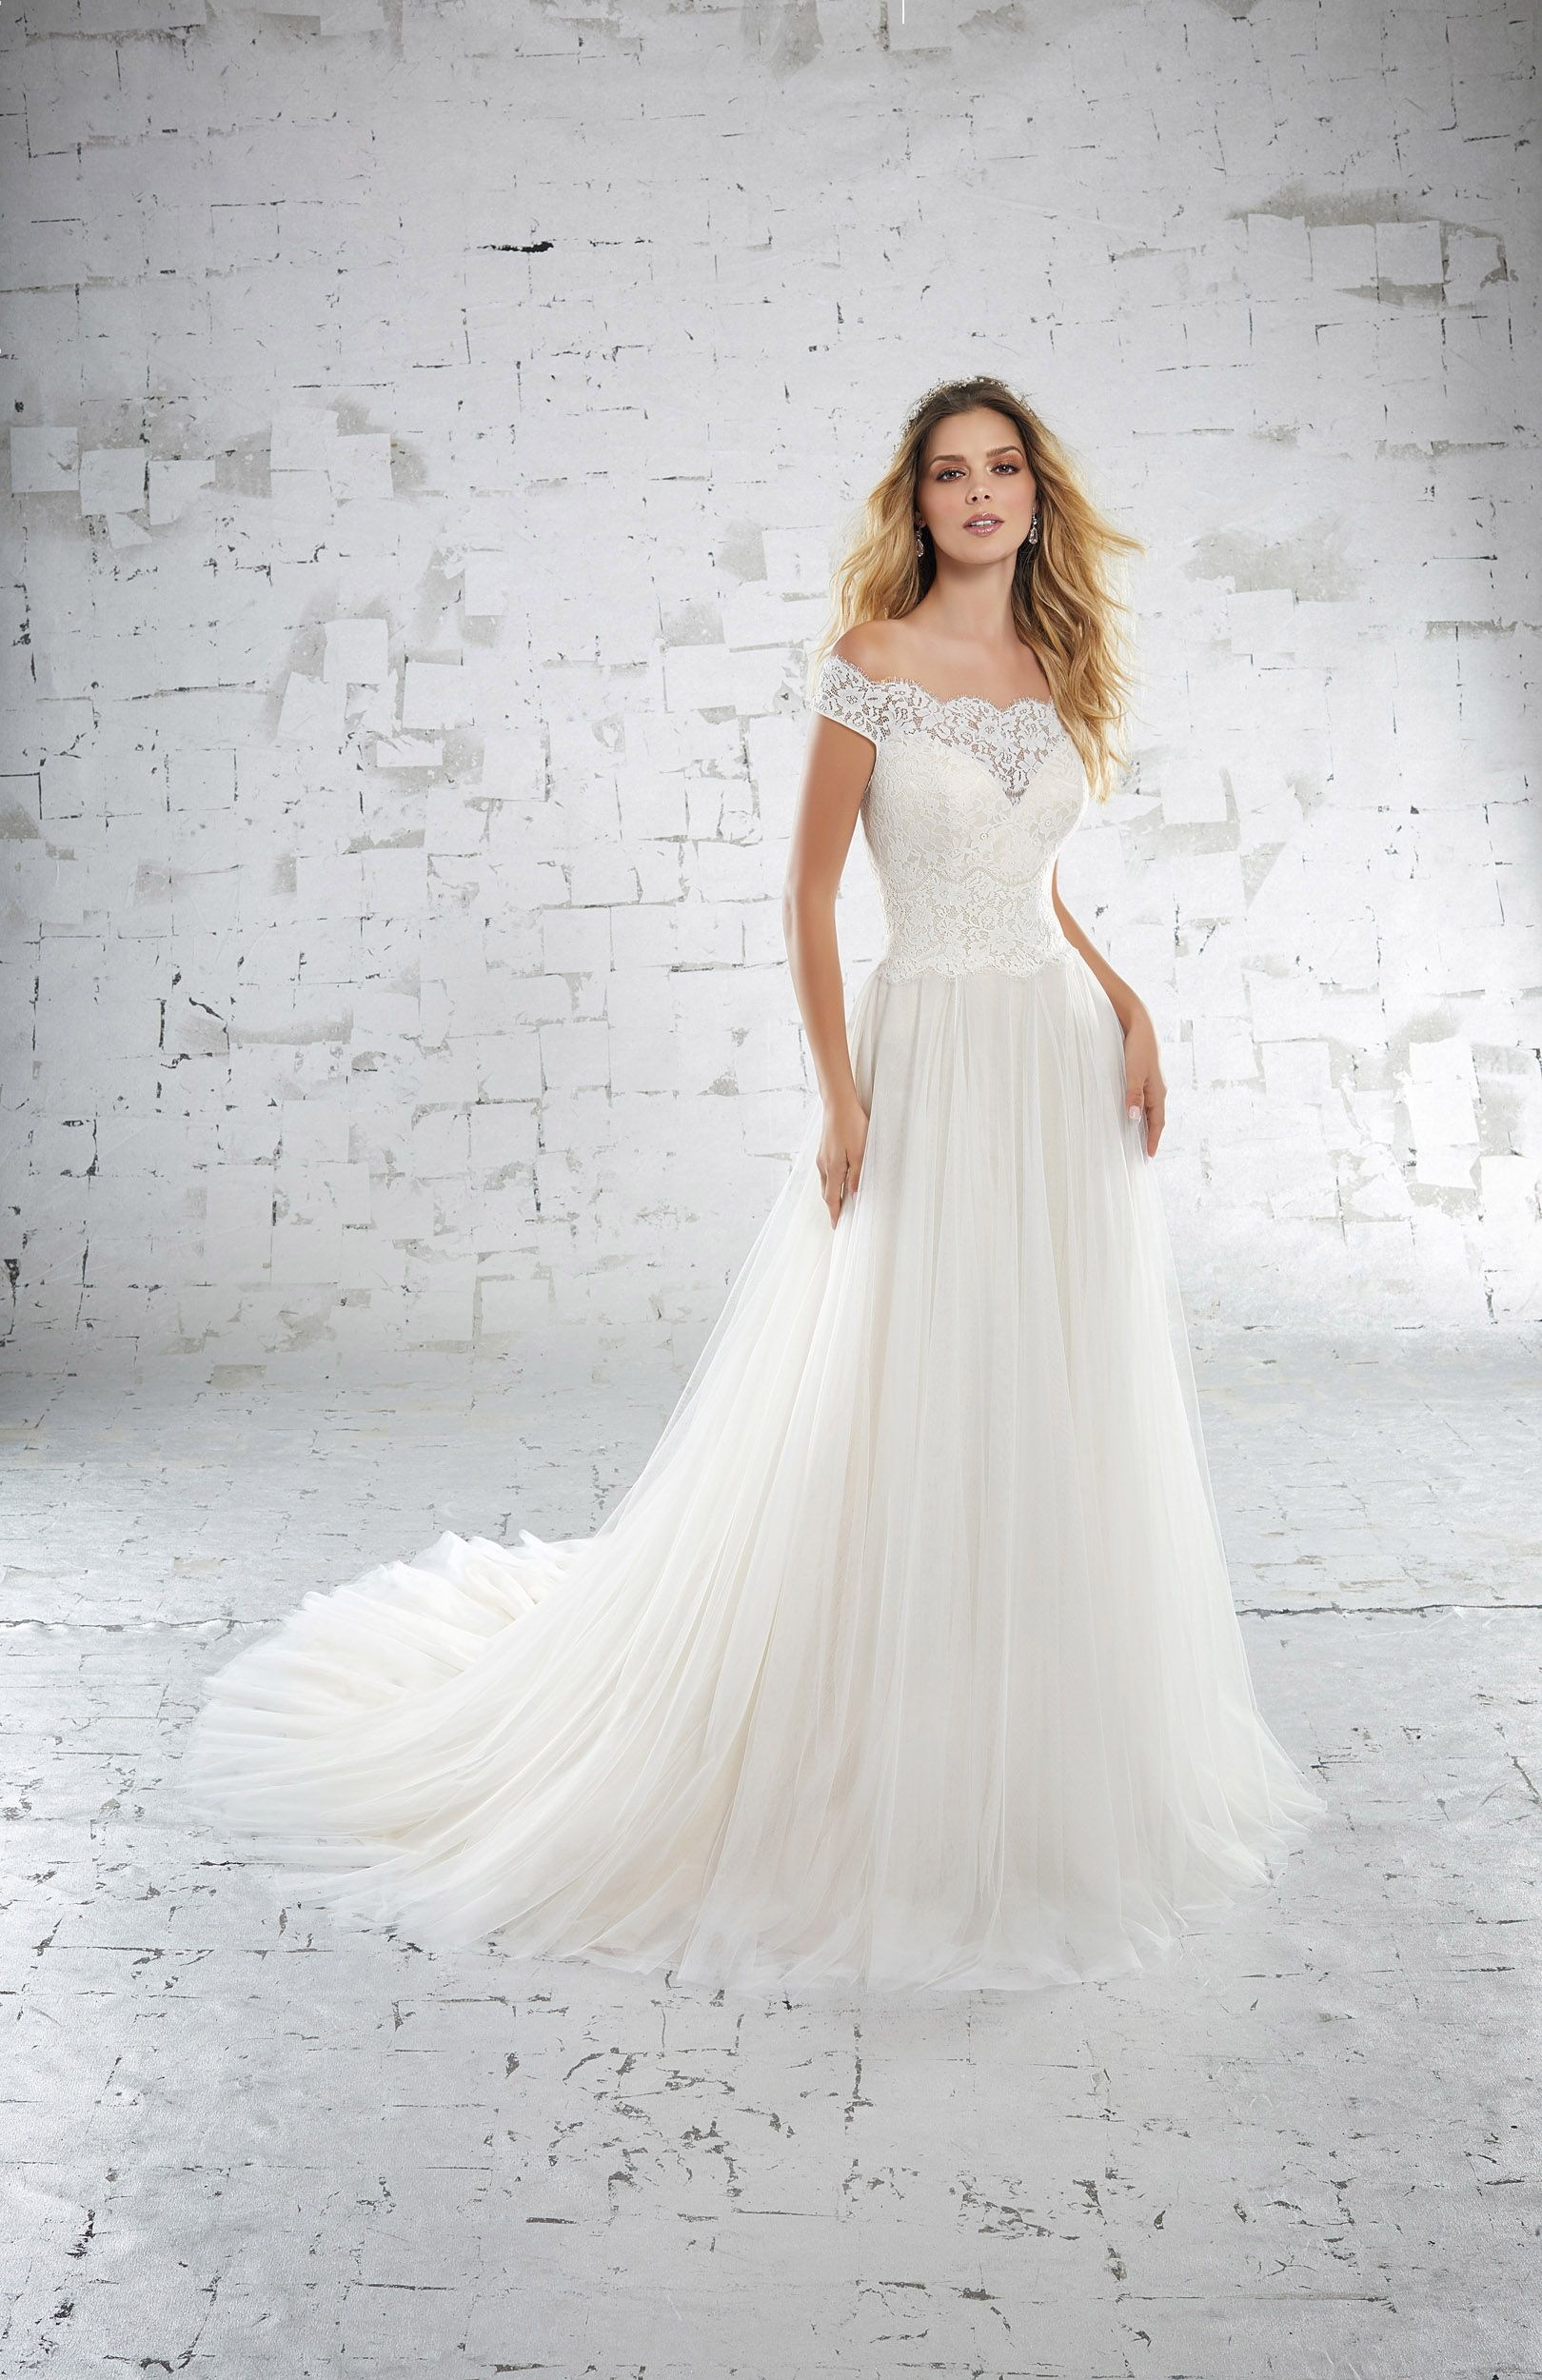 Morilee Wedding Dress Trouwjurk Bruidsjurk Wedding Bruiloft